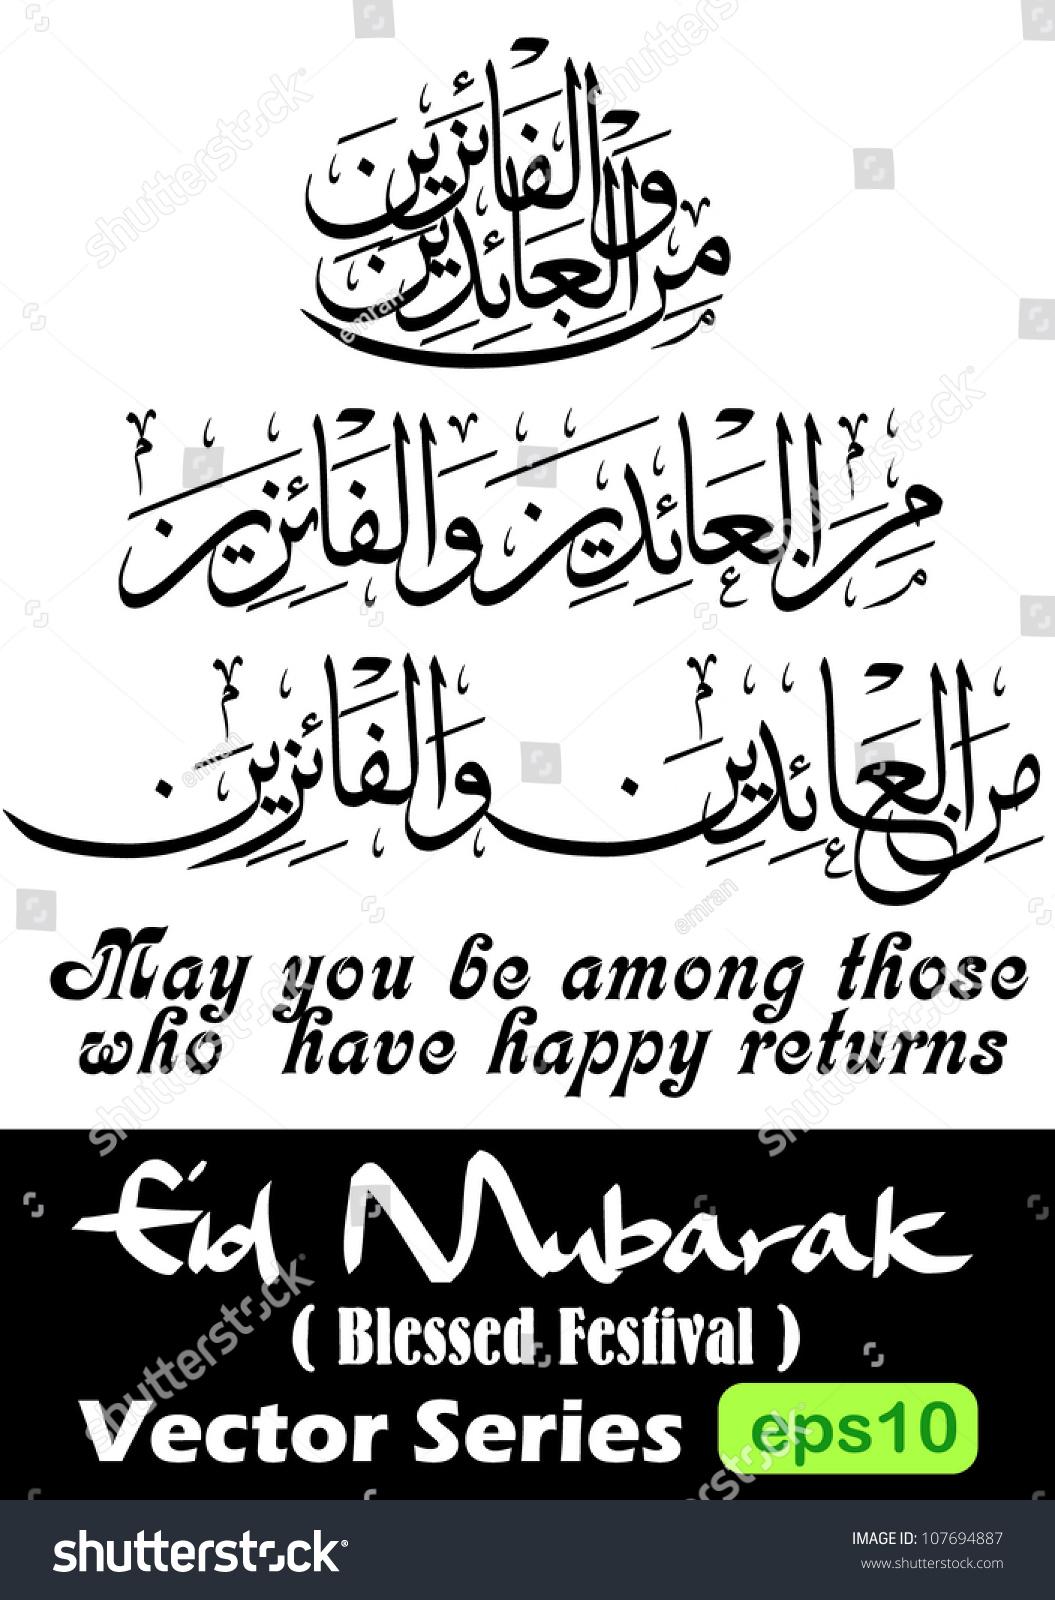 Three 3 arabic calligraphy vectors eid stock vector 107694887 three 3 arabic calligraphy vectors of an eid greeting minal aidin wal kristyandbryce Gallery